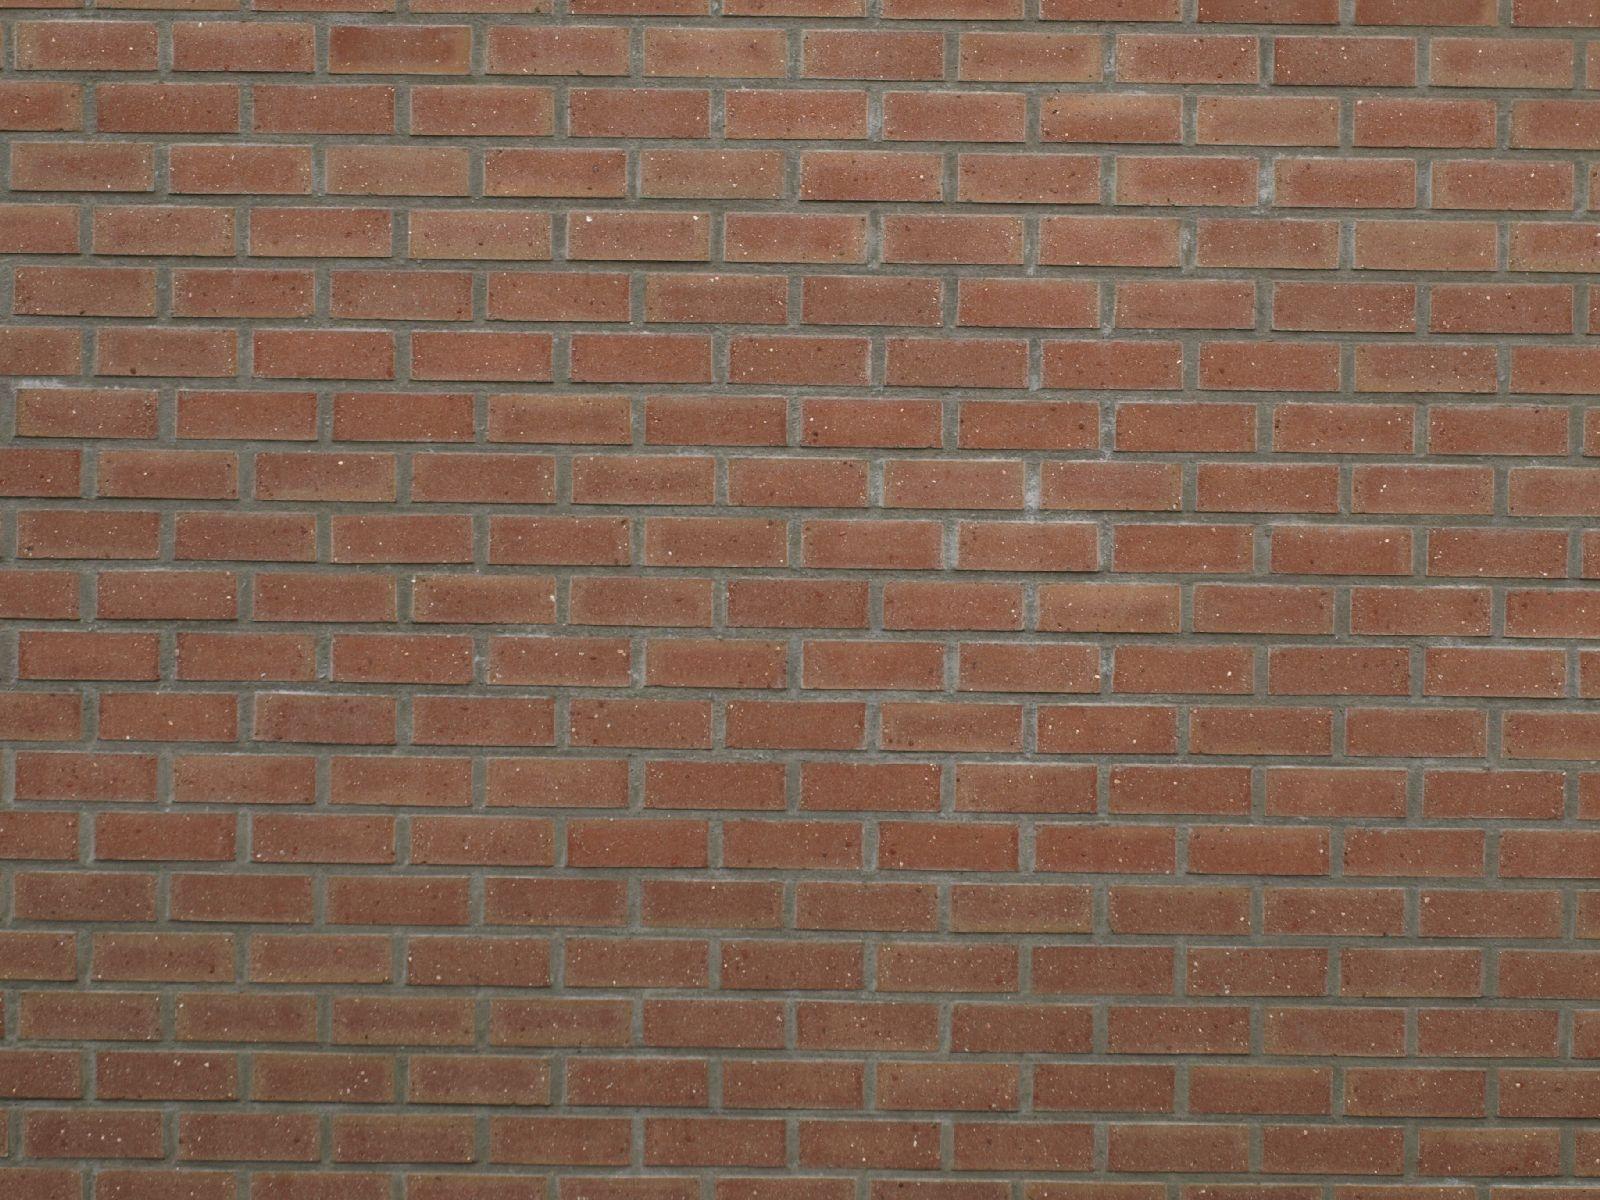 Brick_Texture_A_PA110173